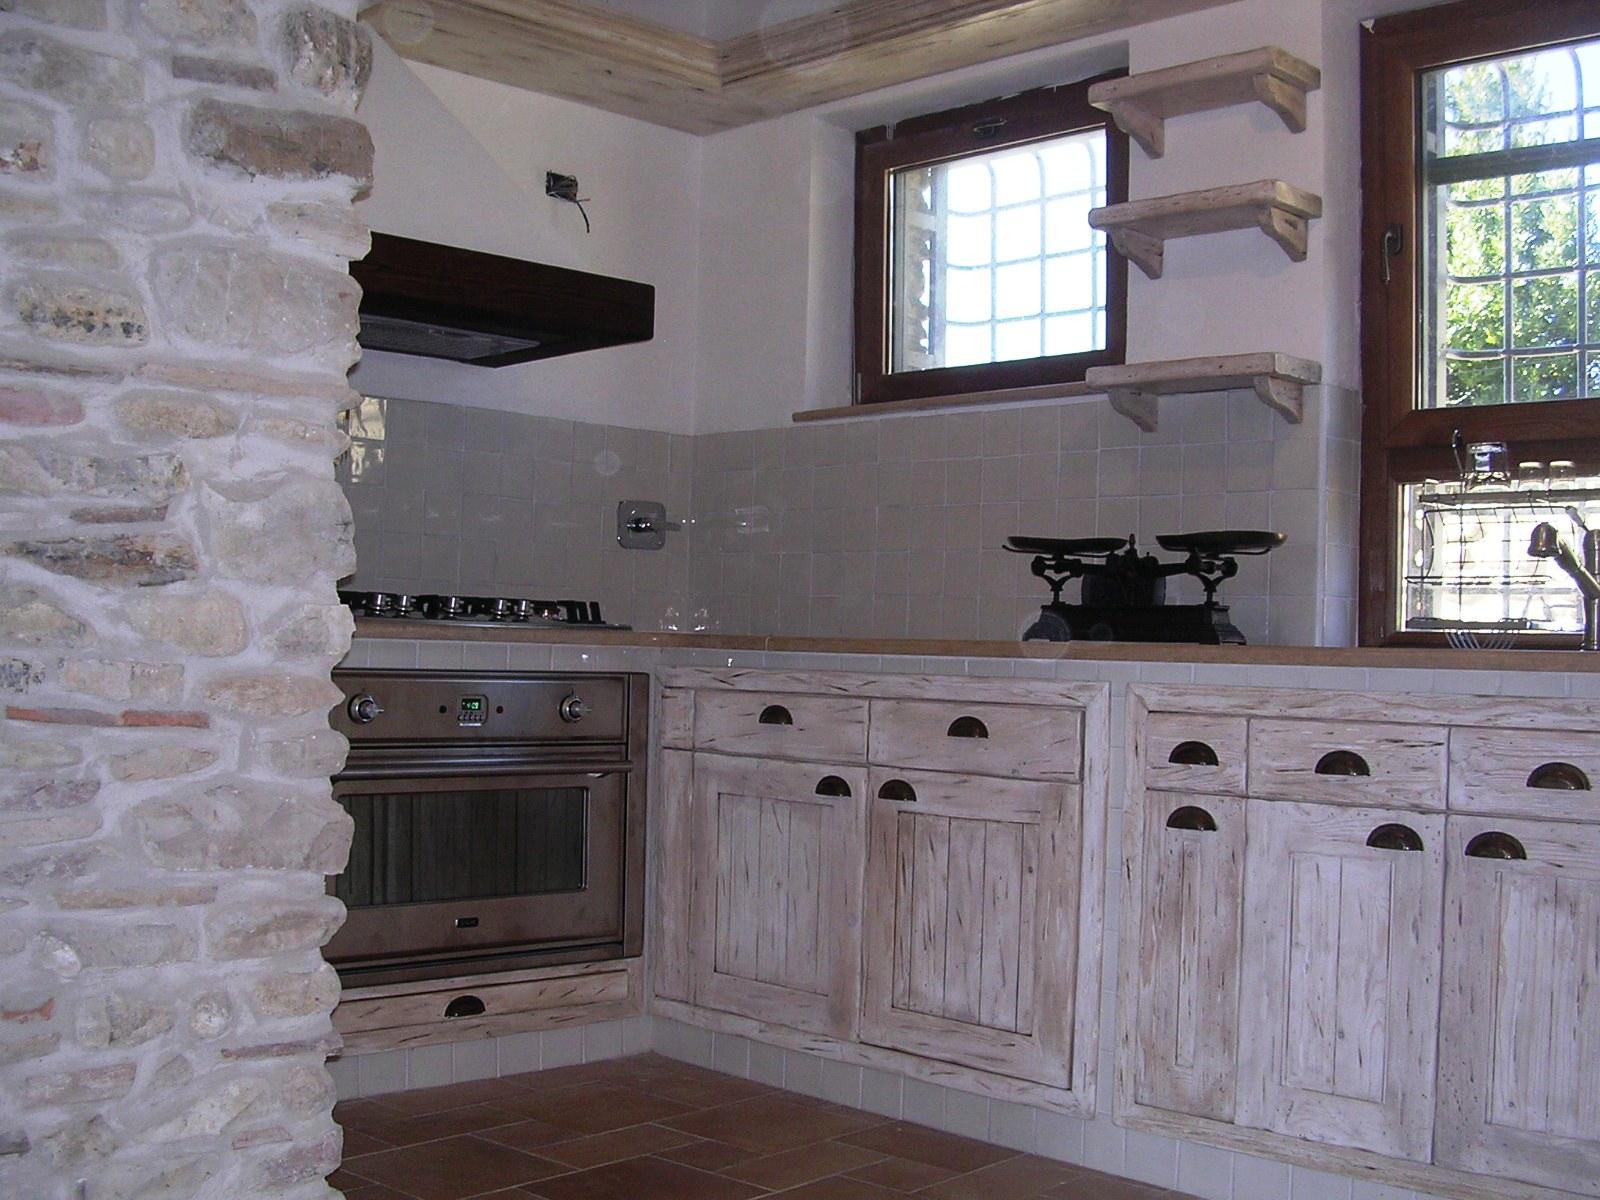 Cucine Componibili E In Muratura.Cucine In Muratura E Componibili Rd Arredamenti Arredo